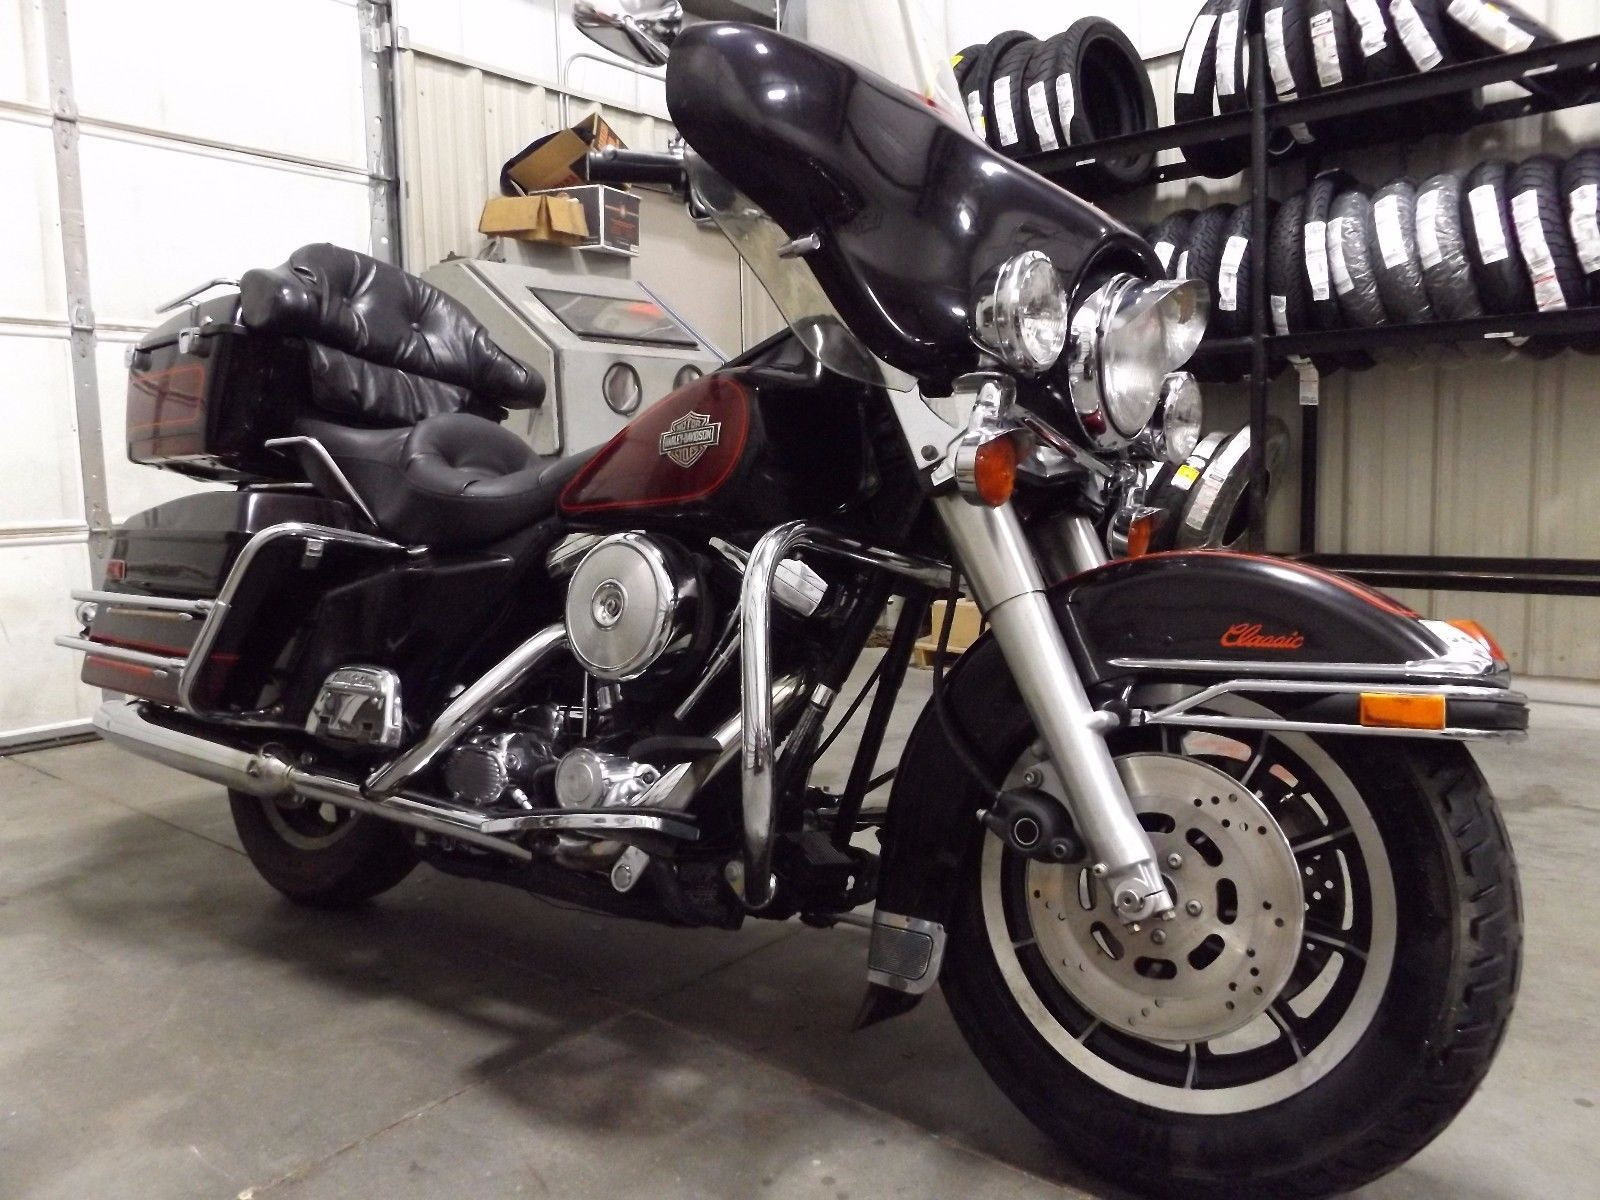 2001 Harley-Davidson Touring   Harley davidson and Clic bikes